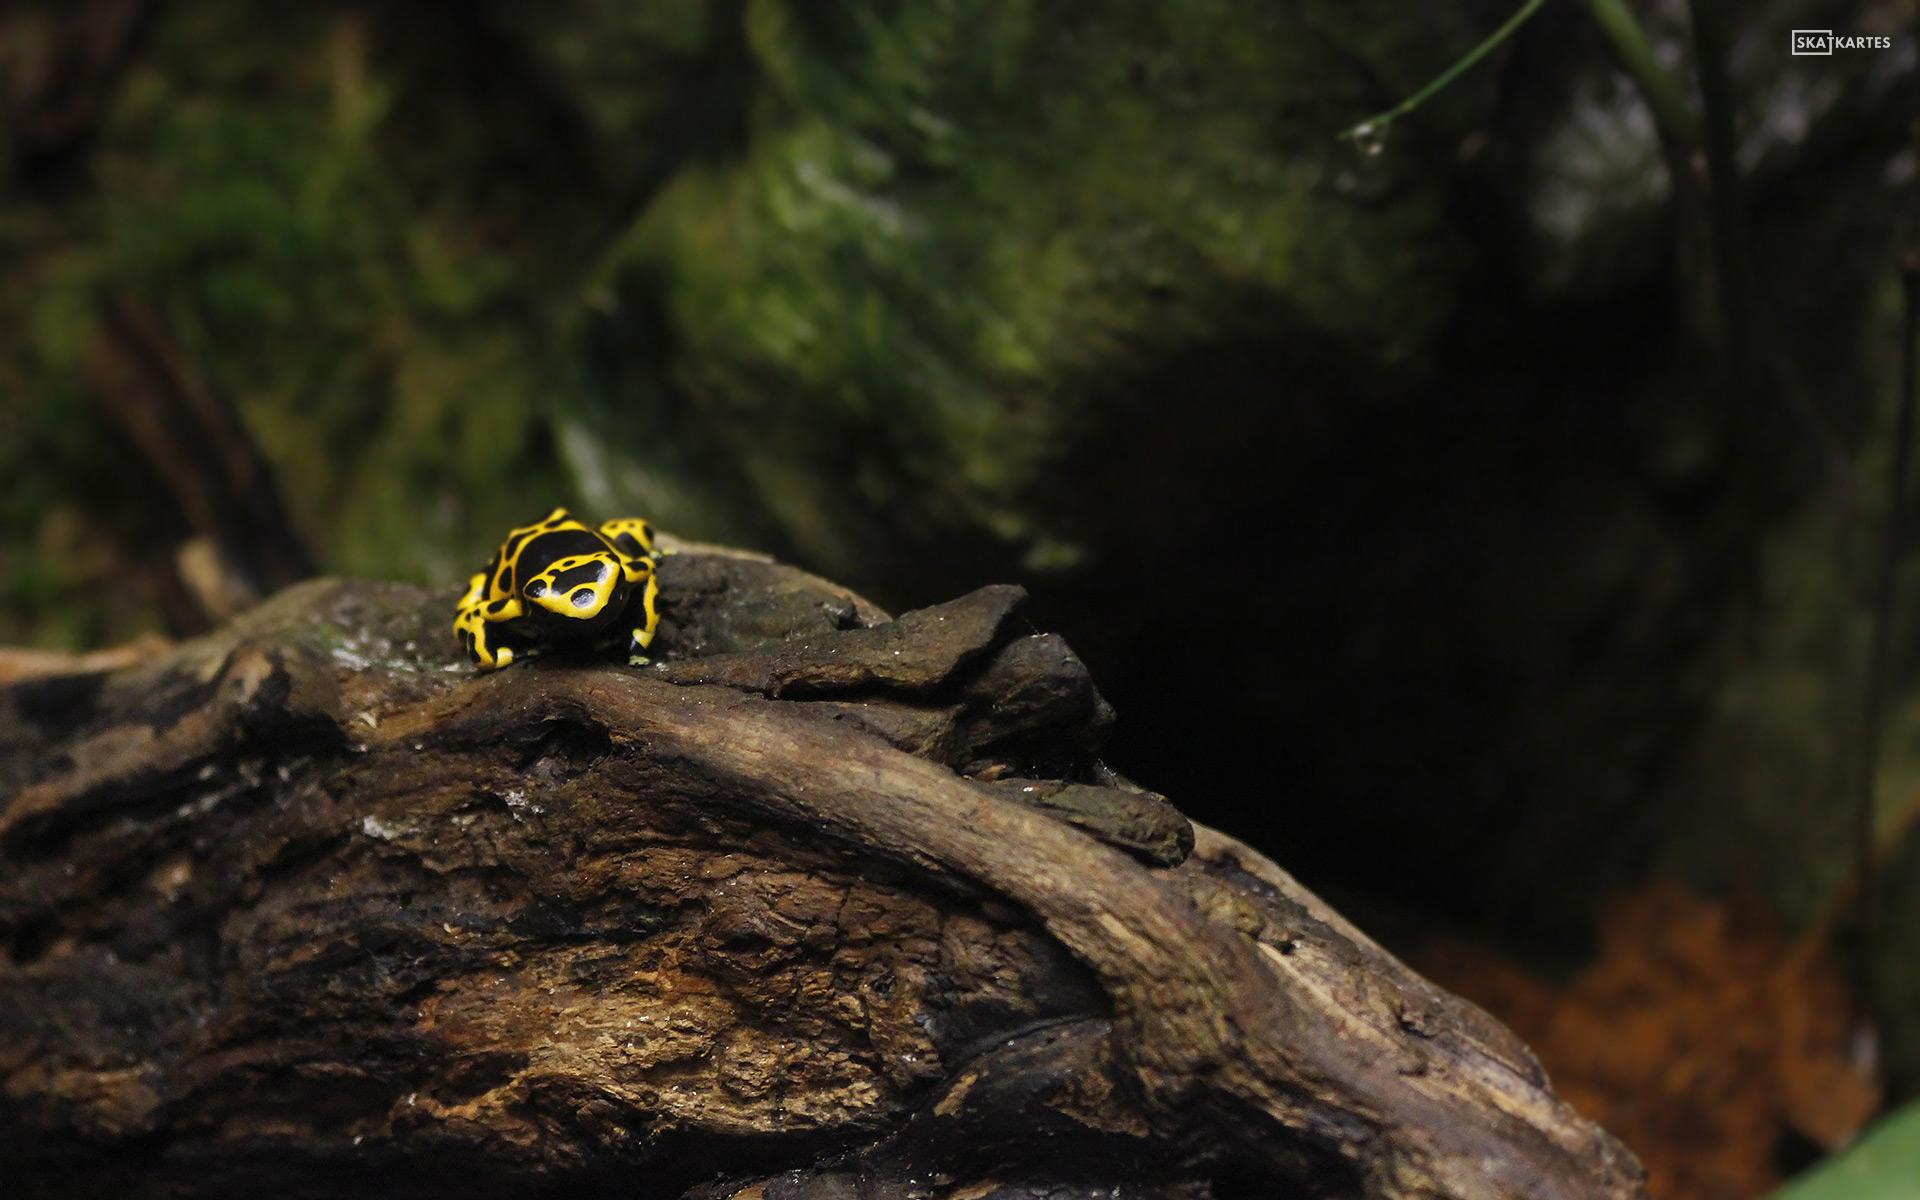 Skatkartes-Latvija-Mezaparks-Rigas-Zoo-Tropu-maja